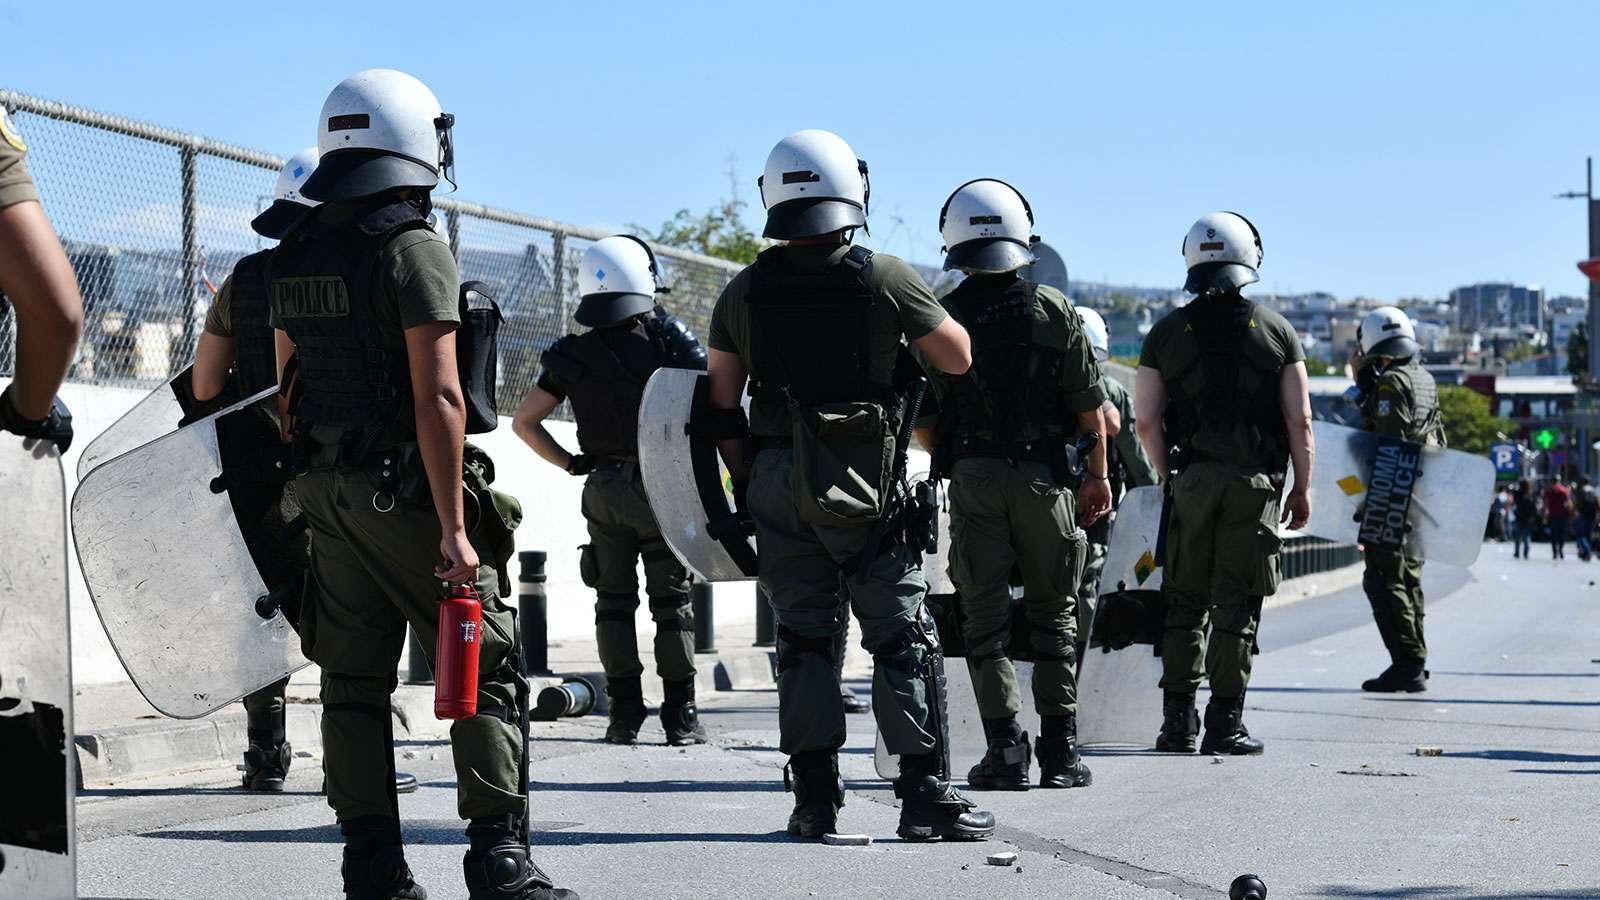 mat-mea Η κυβέρνηση έπνιξε με χημικά τη διαδήλωση των μαθητών2